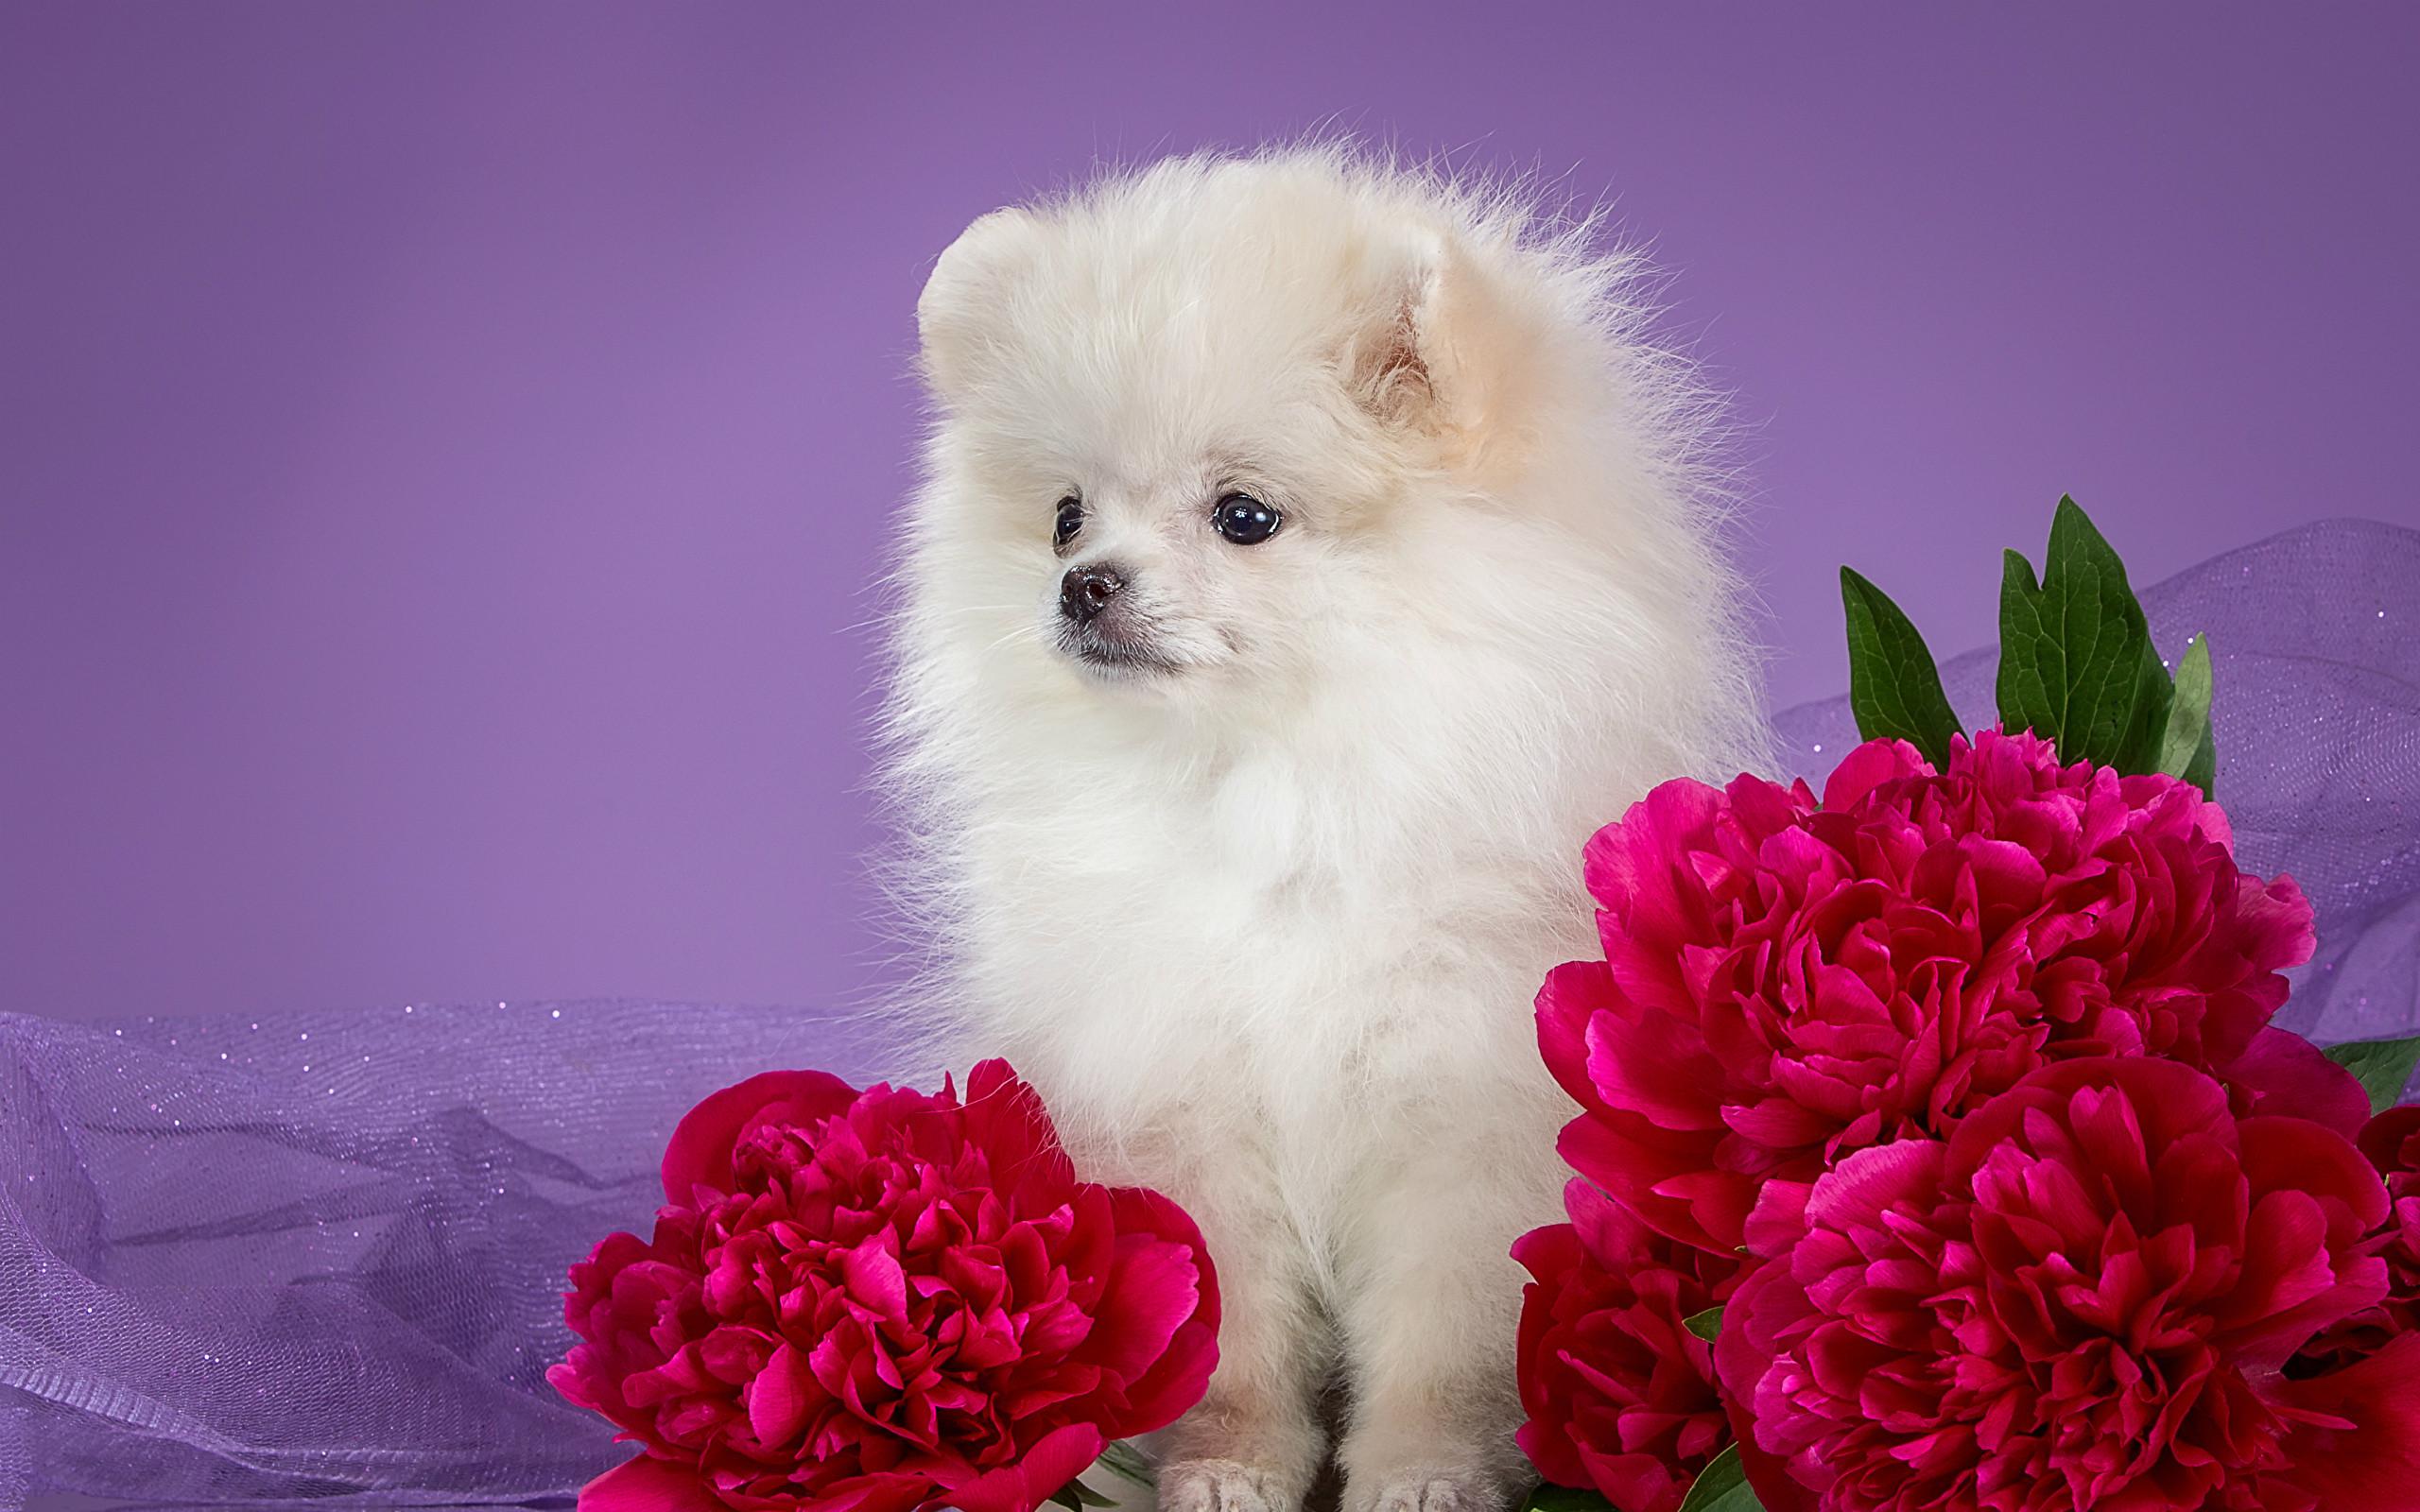 Cute Husky Wallpaper Hd Puppies In Flowers Computer Wallpaper 50 Images